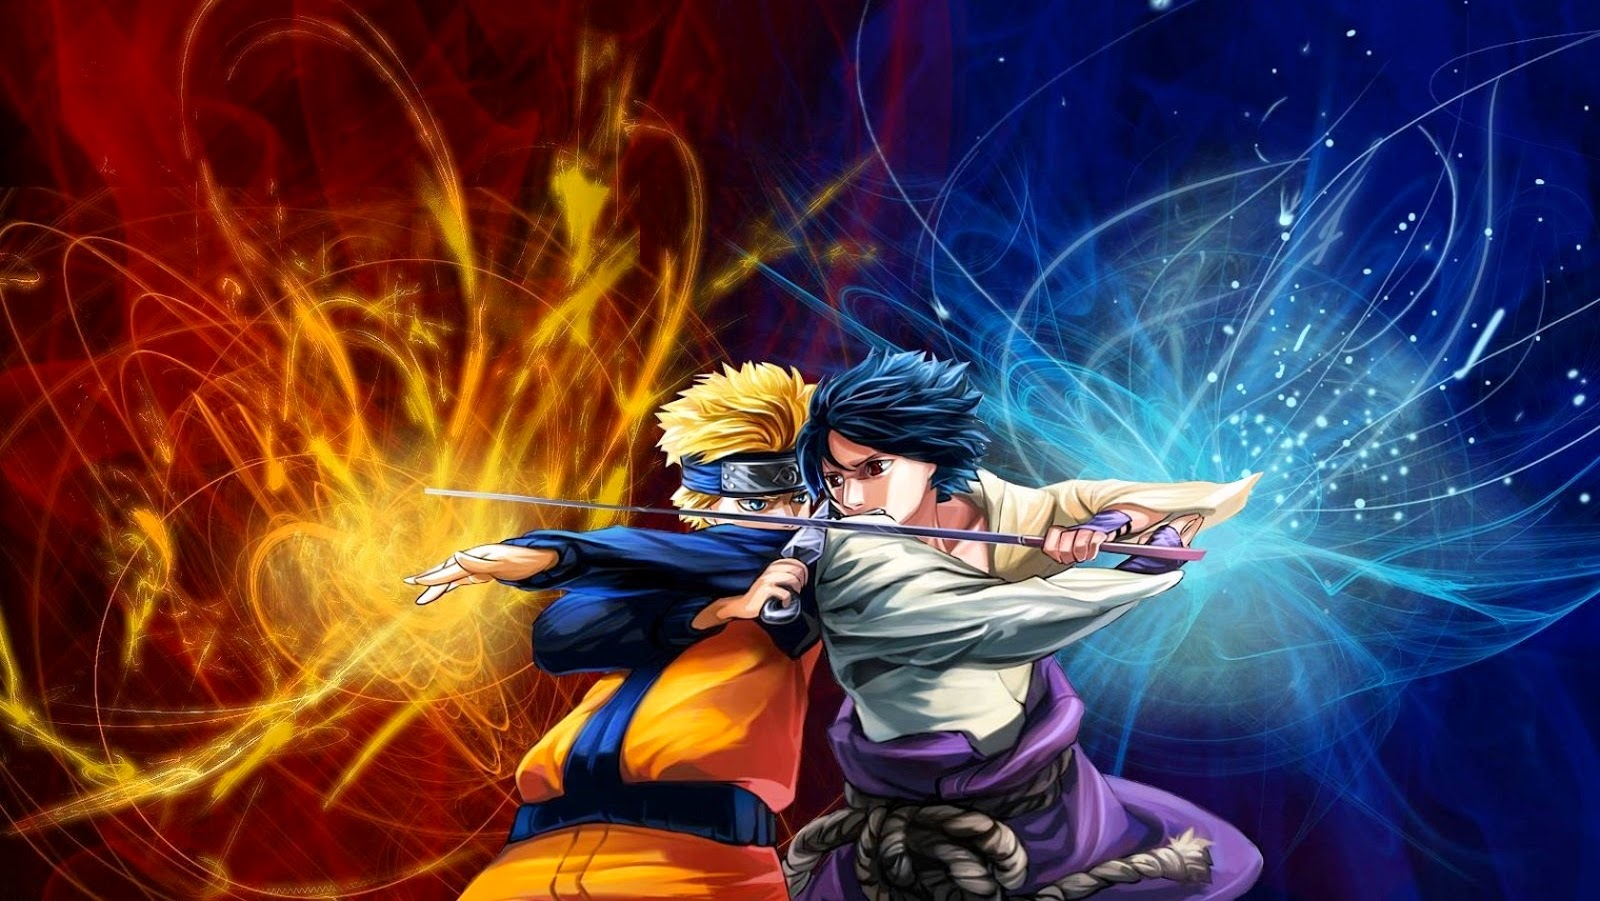 Iphone Wallpapers Hd Free Download Naruto Vs Sasuke Hd Wallpapers